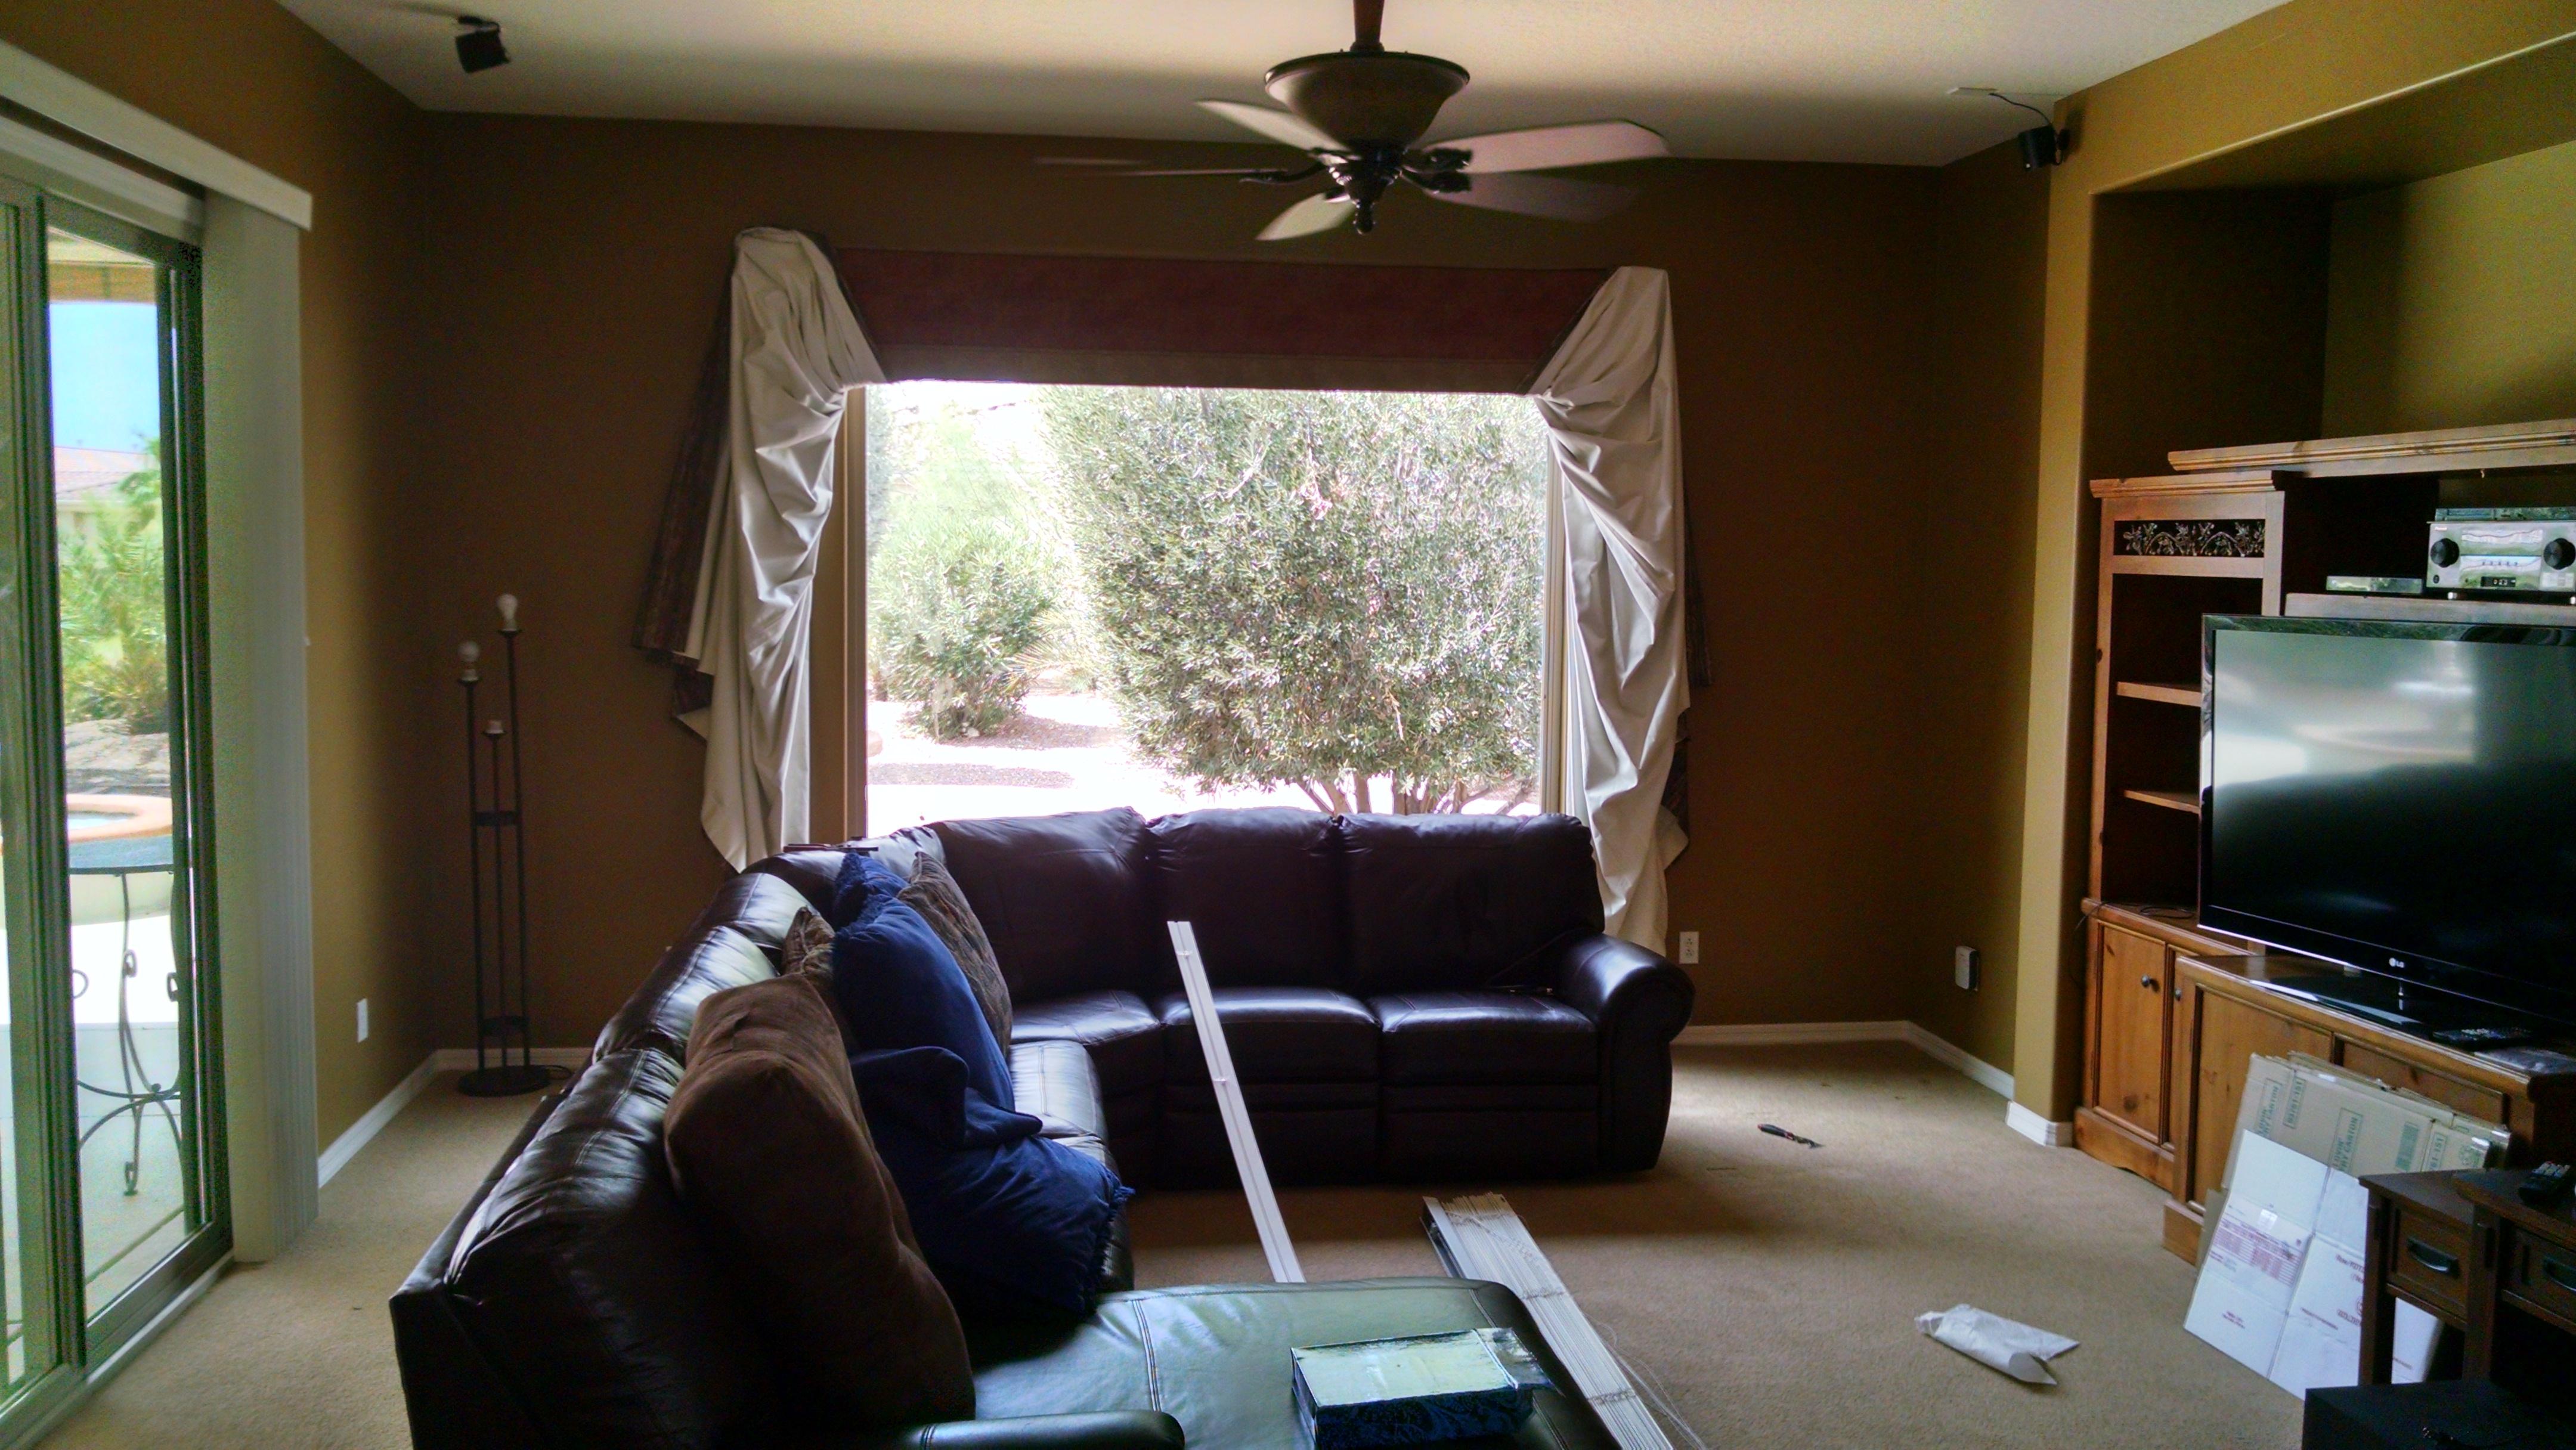 Window Replacement Completion In Phoenix Az